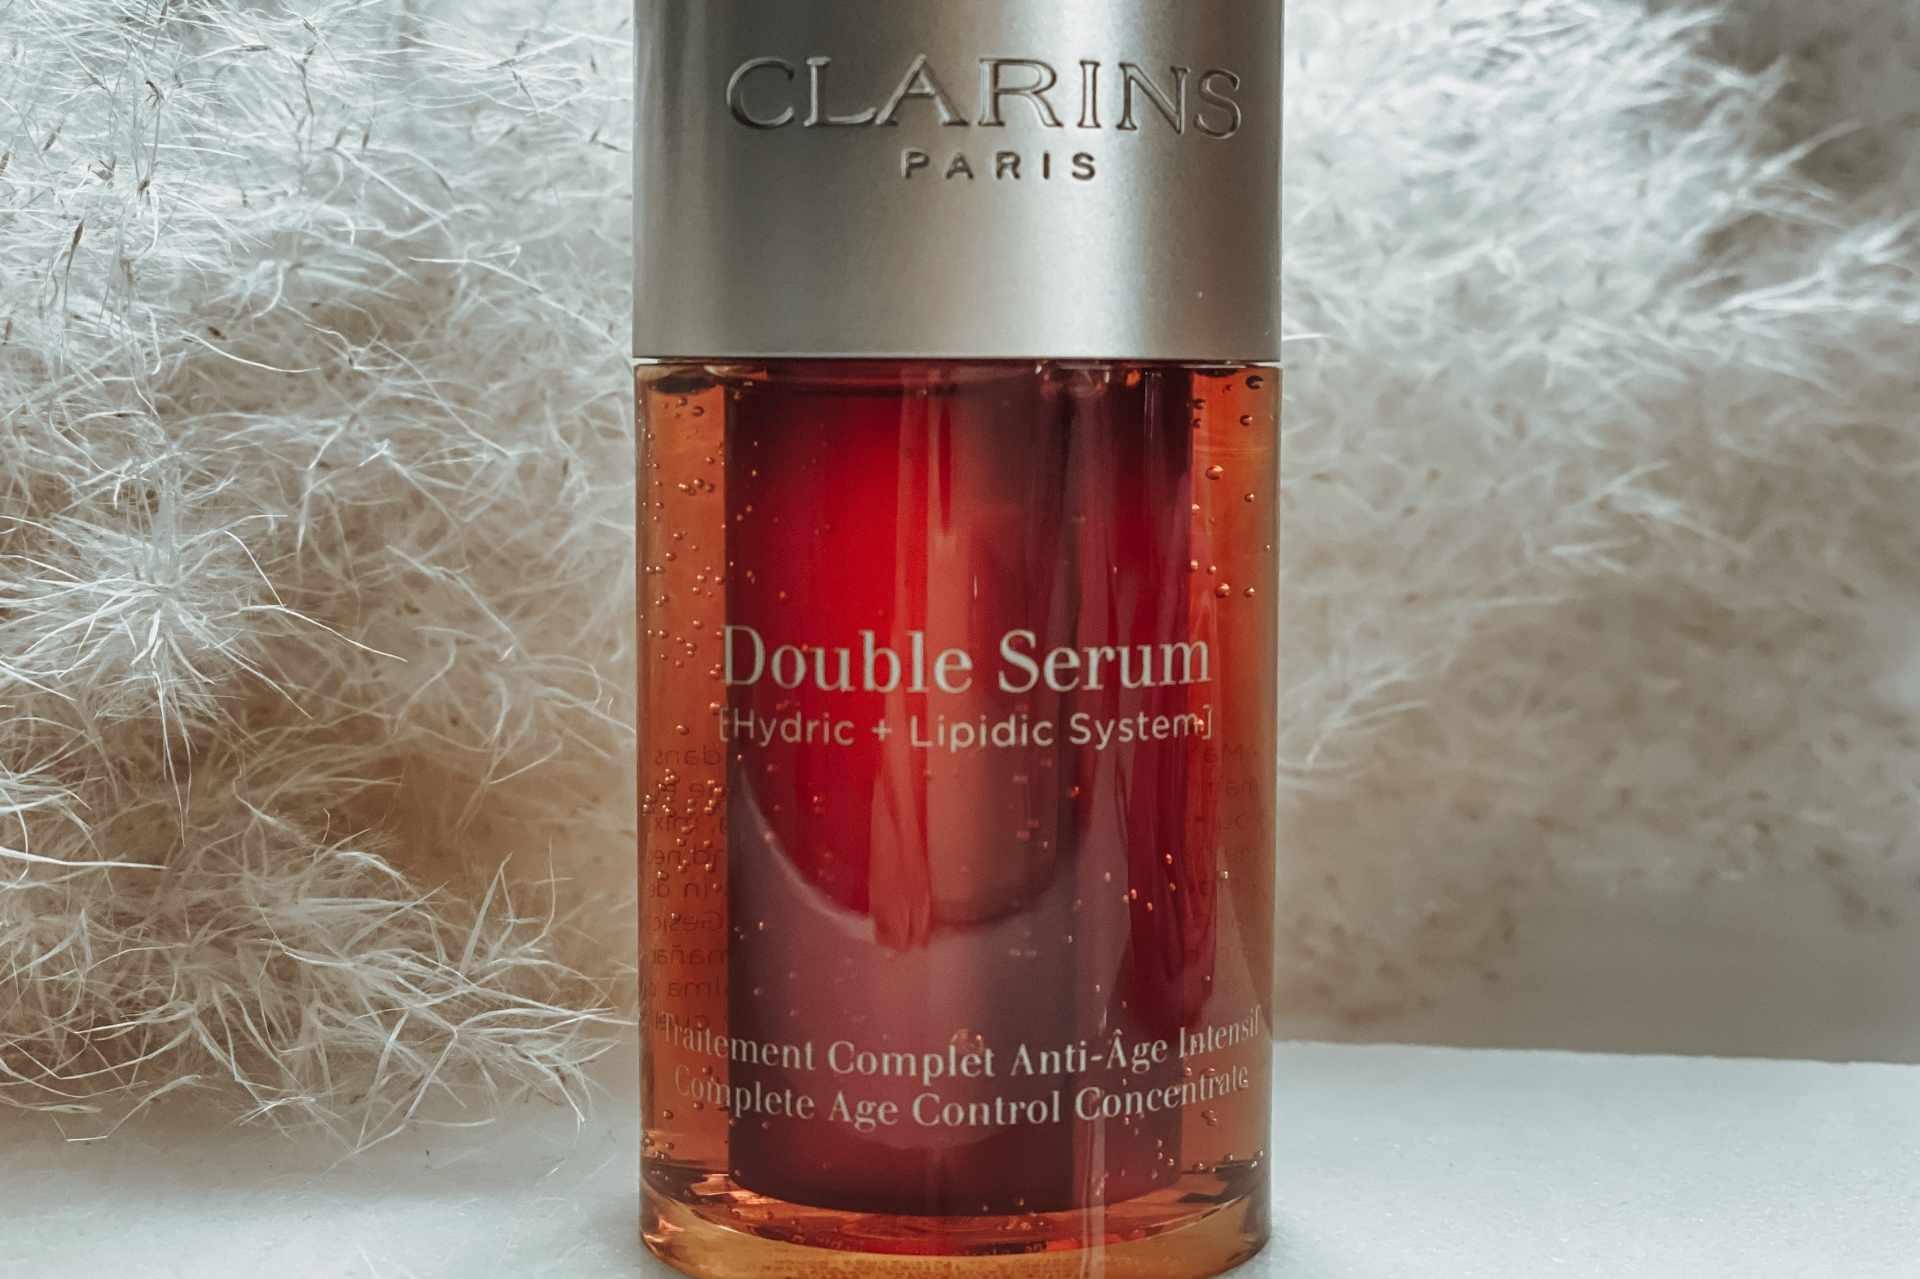 Clarins Double Serum closeup